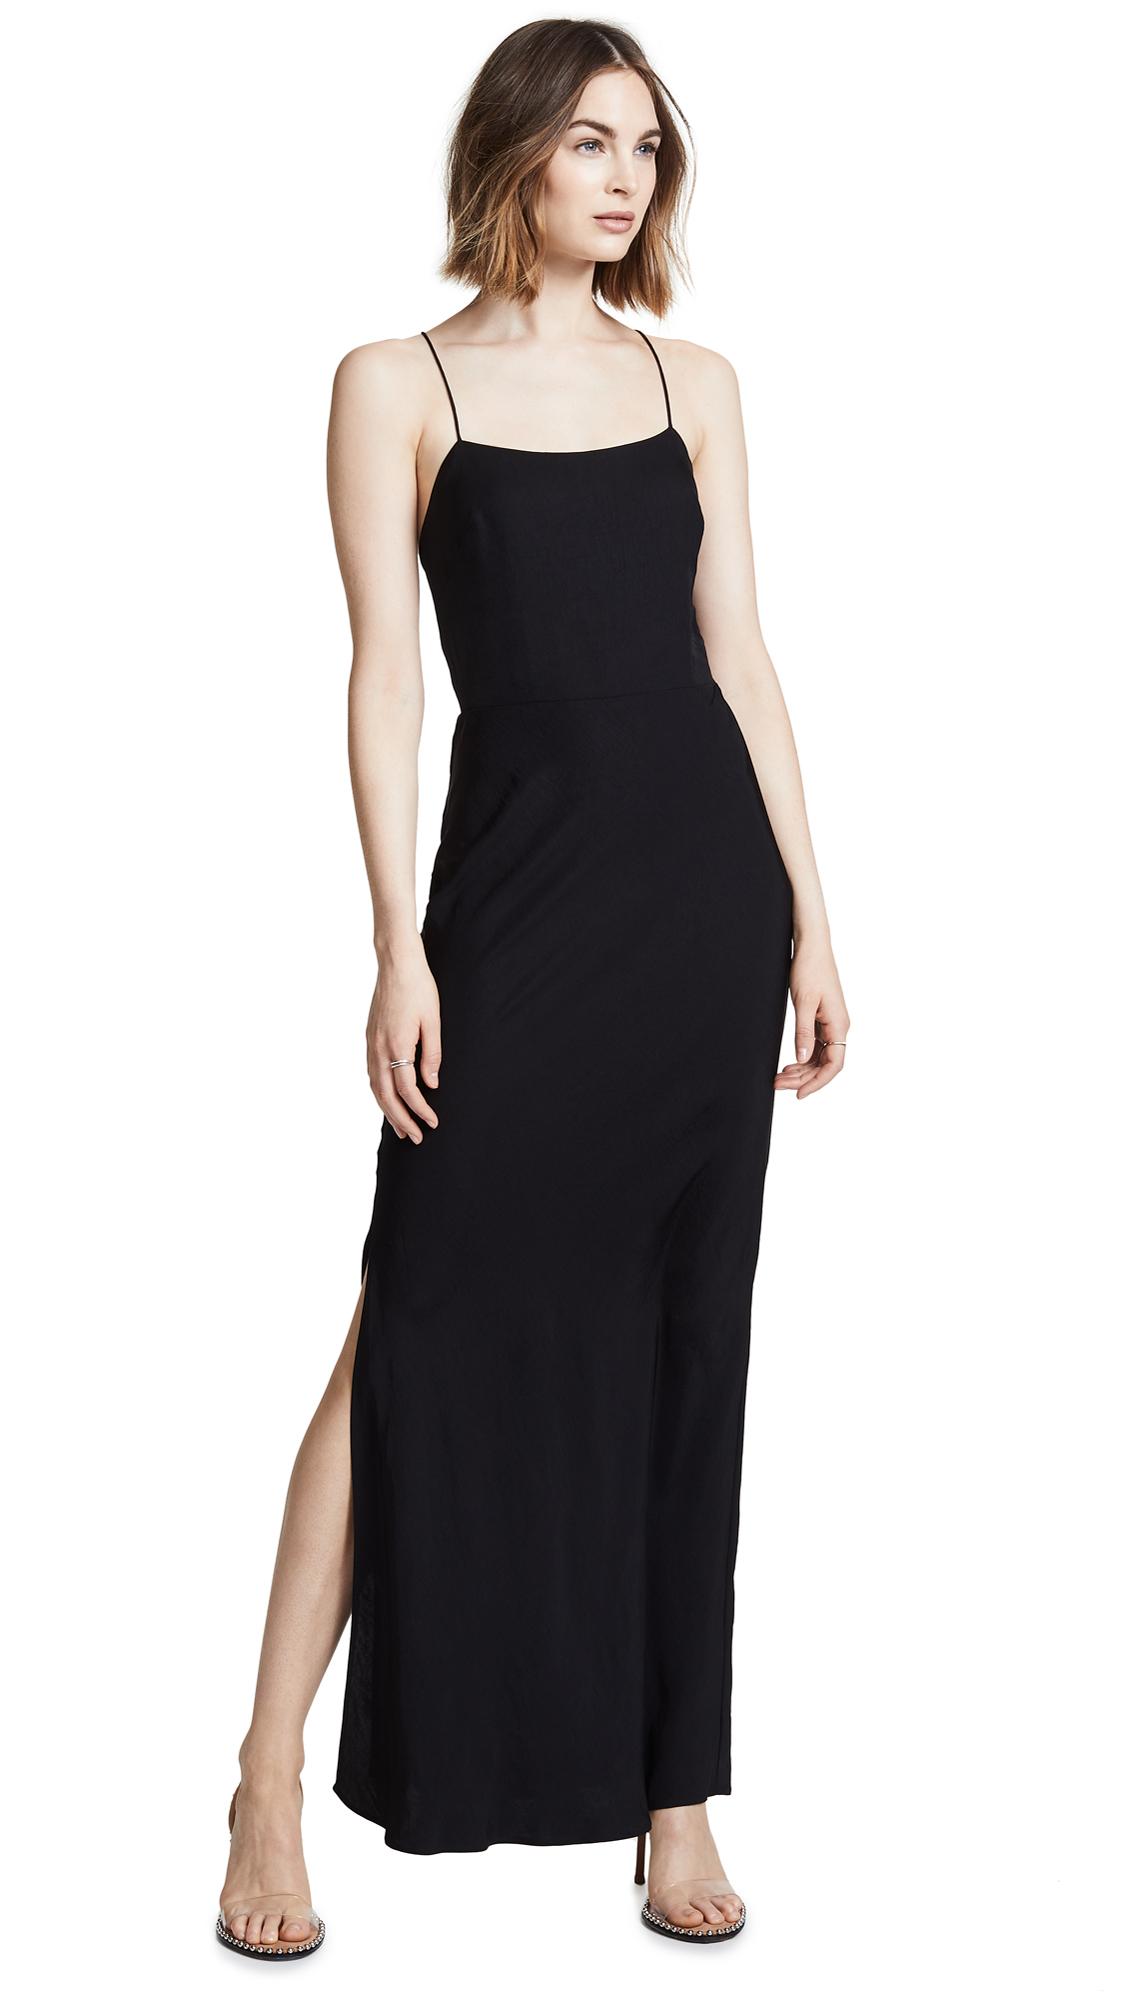 JASON WU GREY Open-Back Crepe Maxi Dress in Black